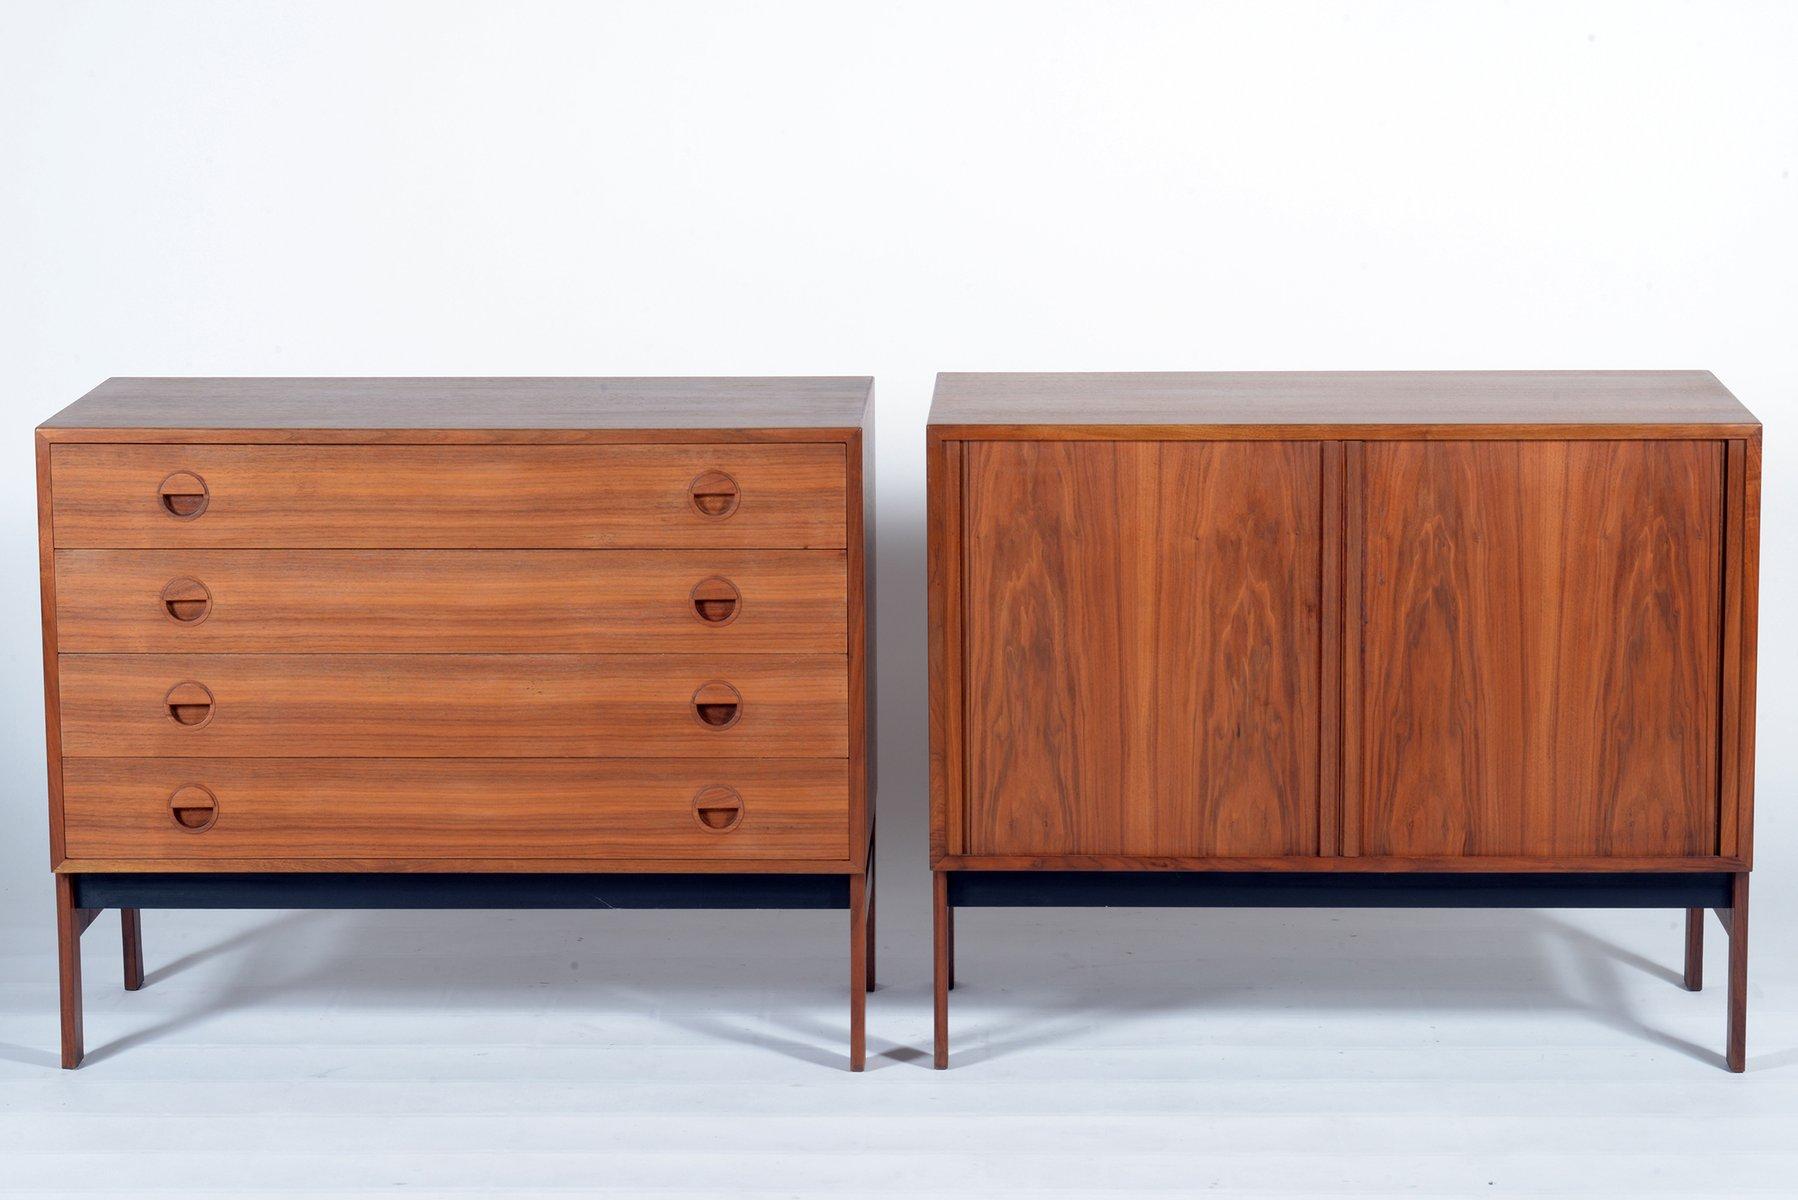 Mid Century Danish Credenza : Danish mid century teak wood chest and credenza 1955 bei pamono kaufen